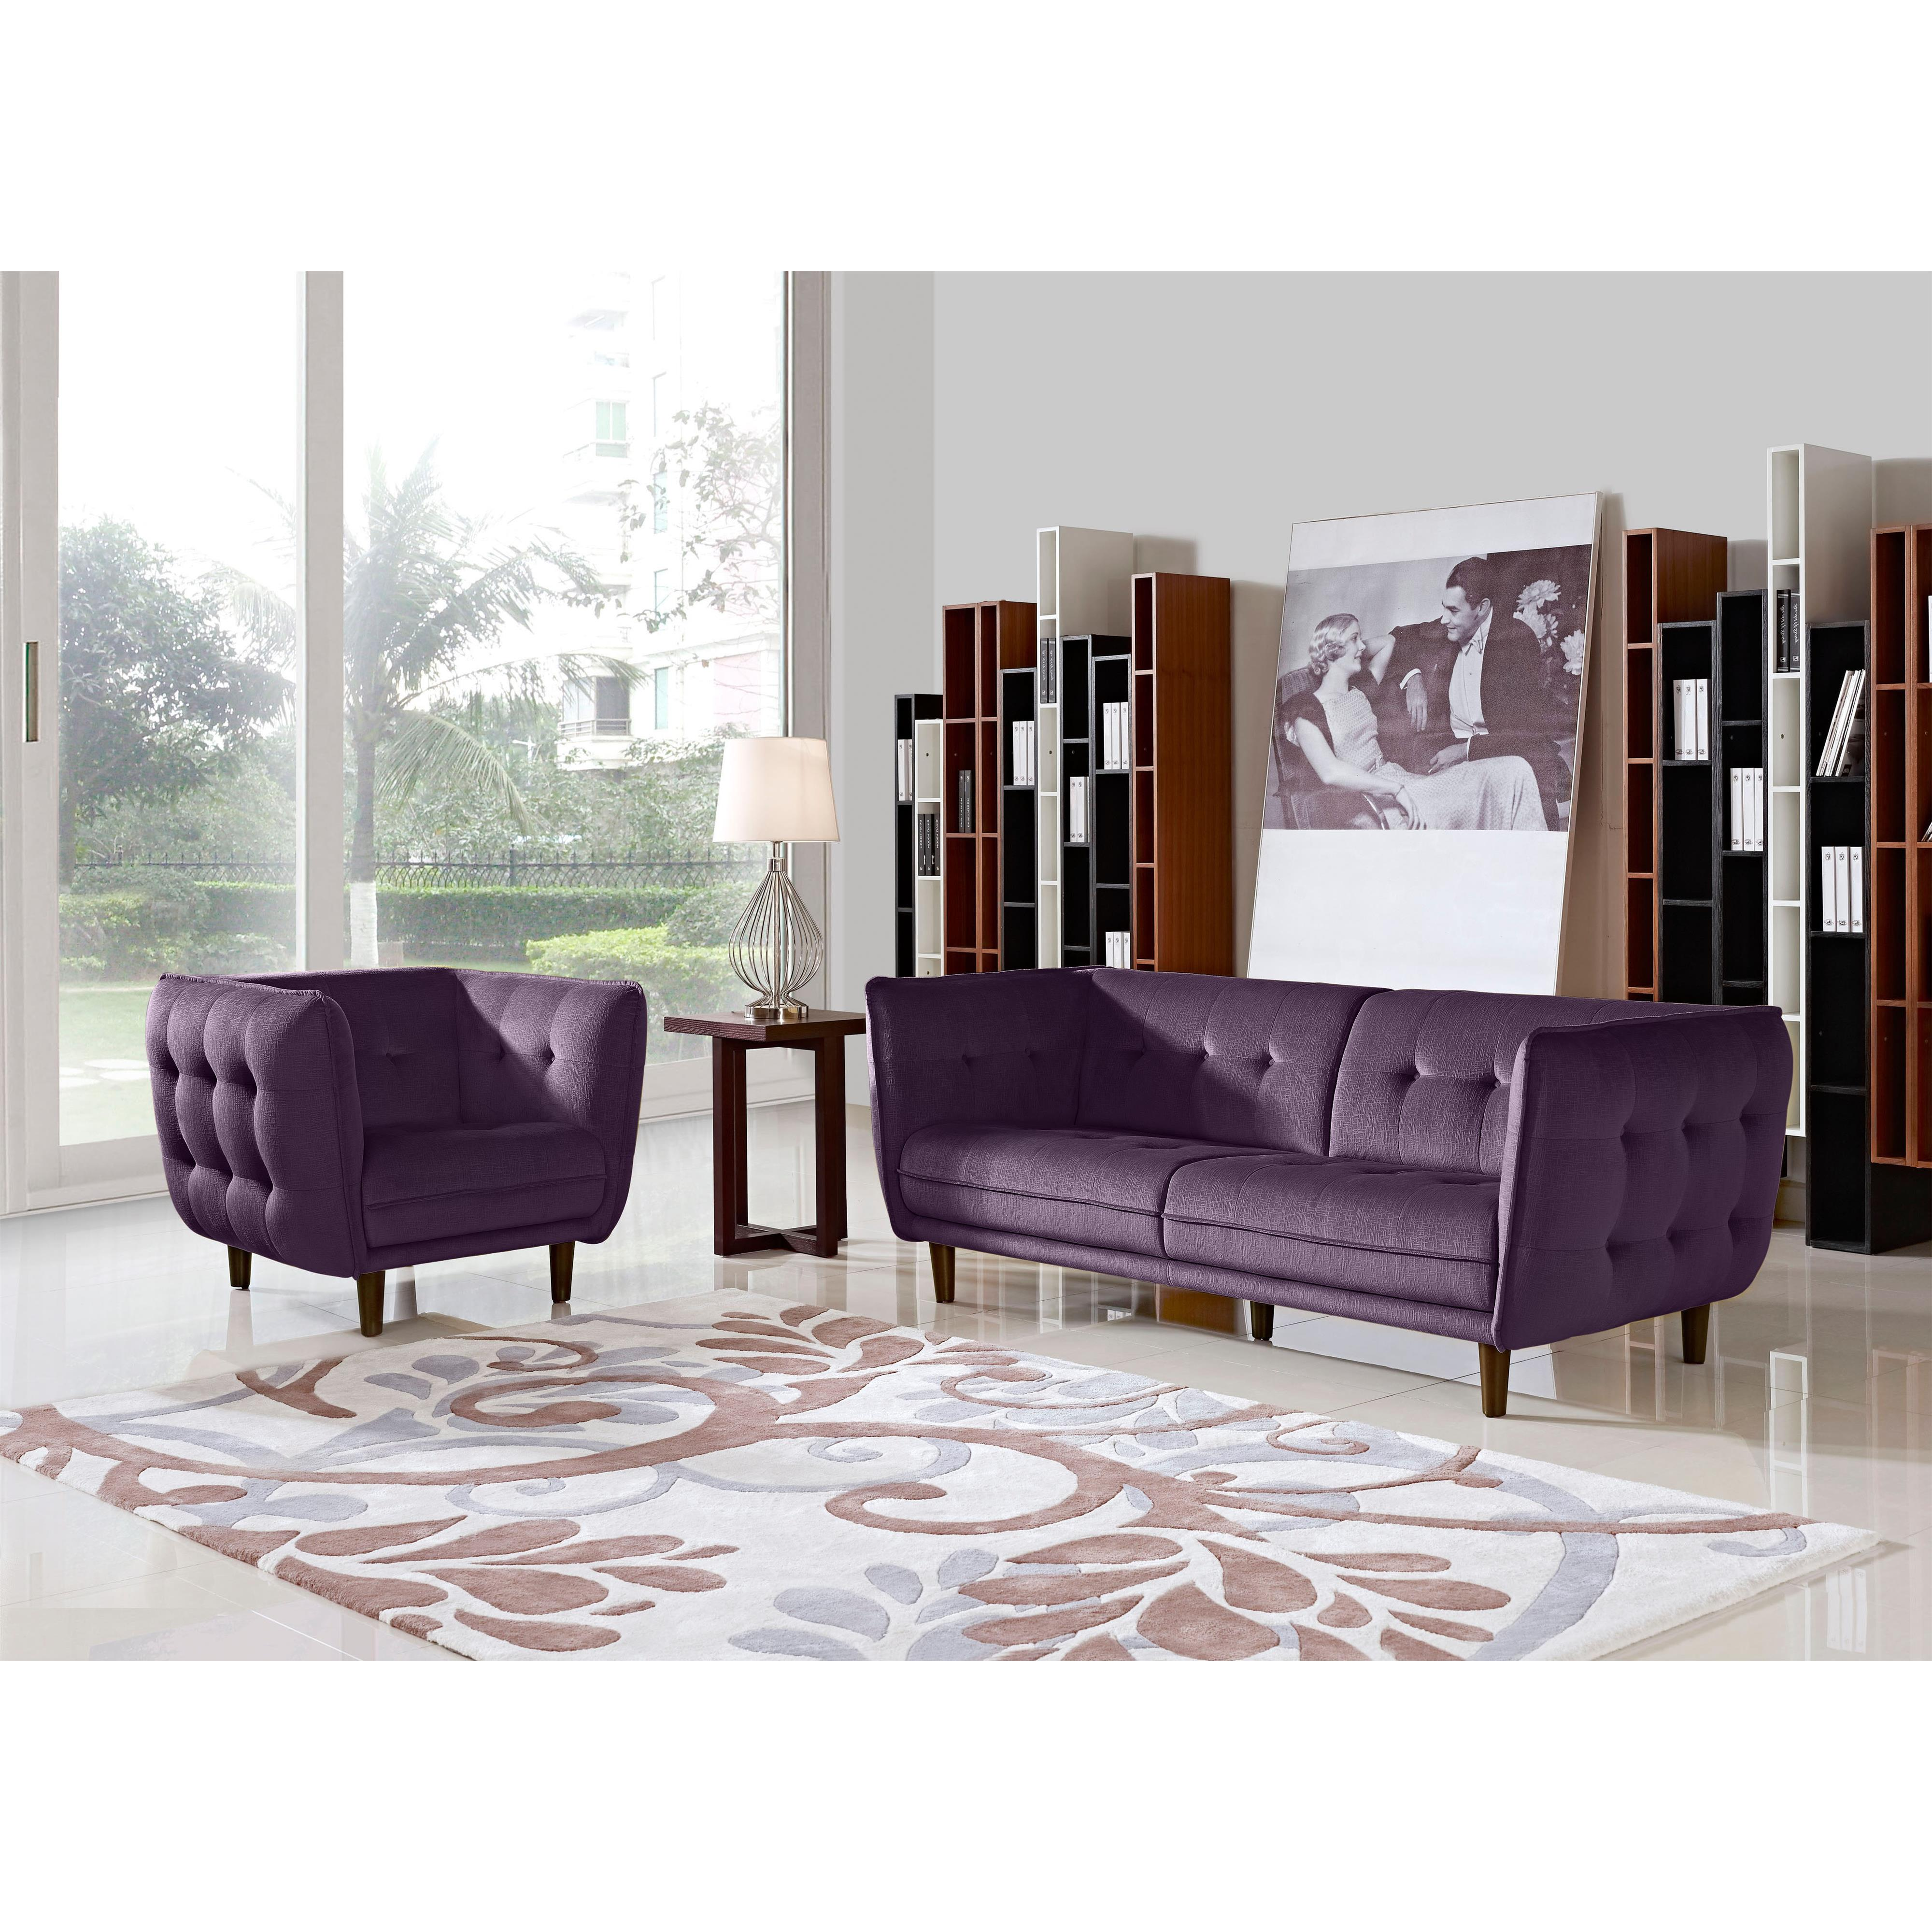 Diamond Sofa Venice Fabric Sofa & Chair 2-Piece Set - Item Number: VENICESCPR